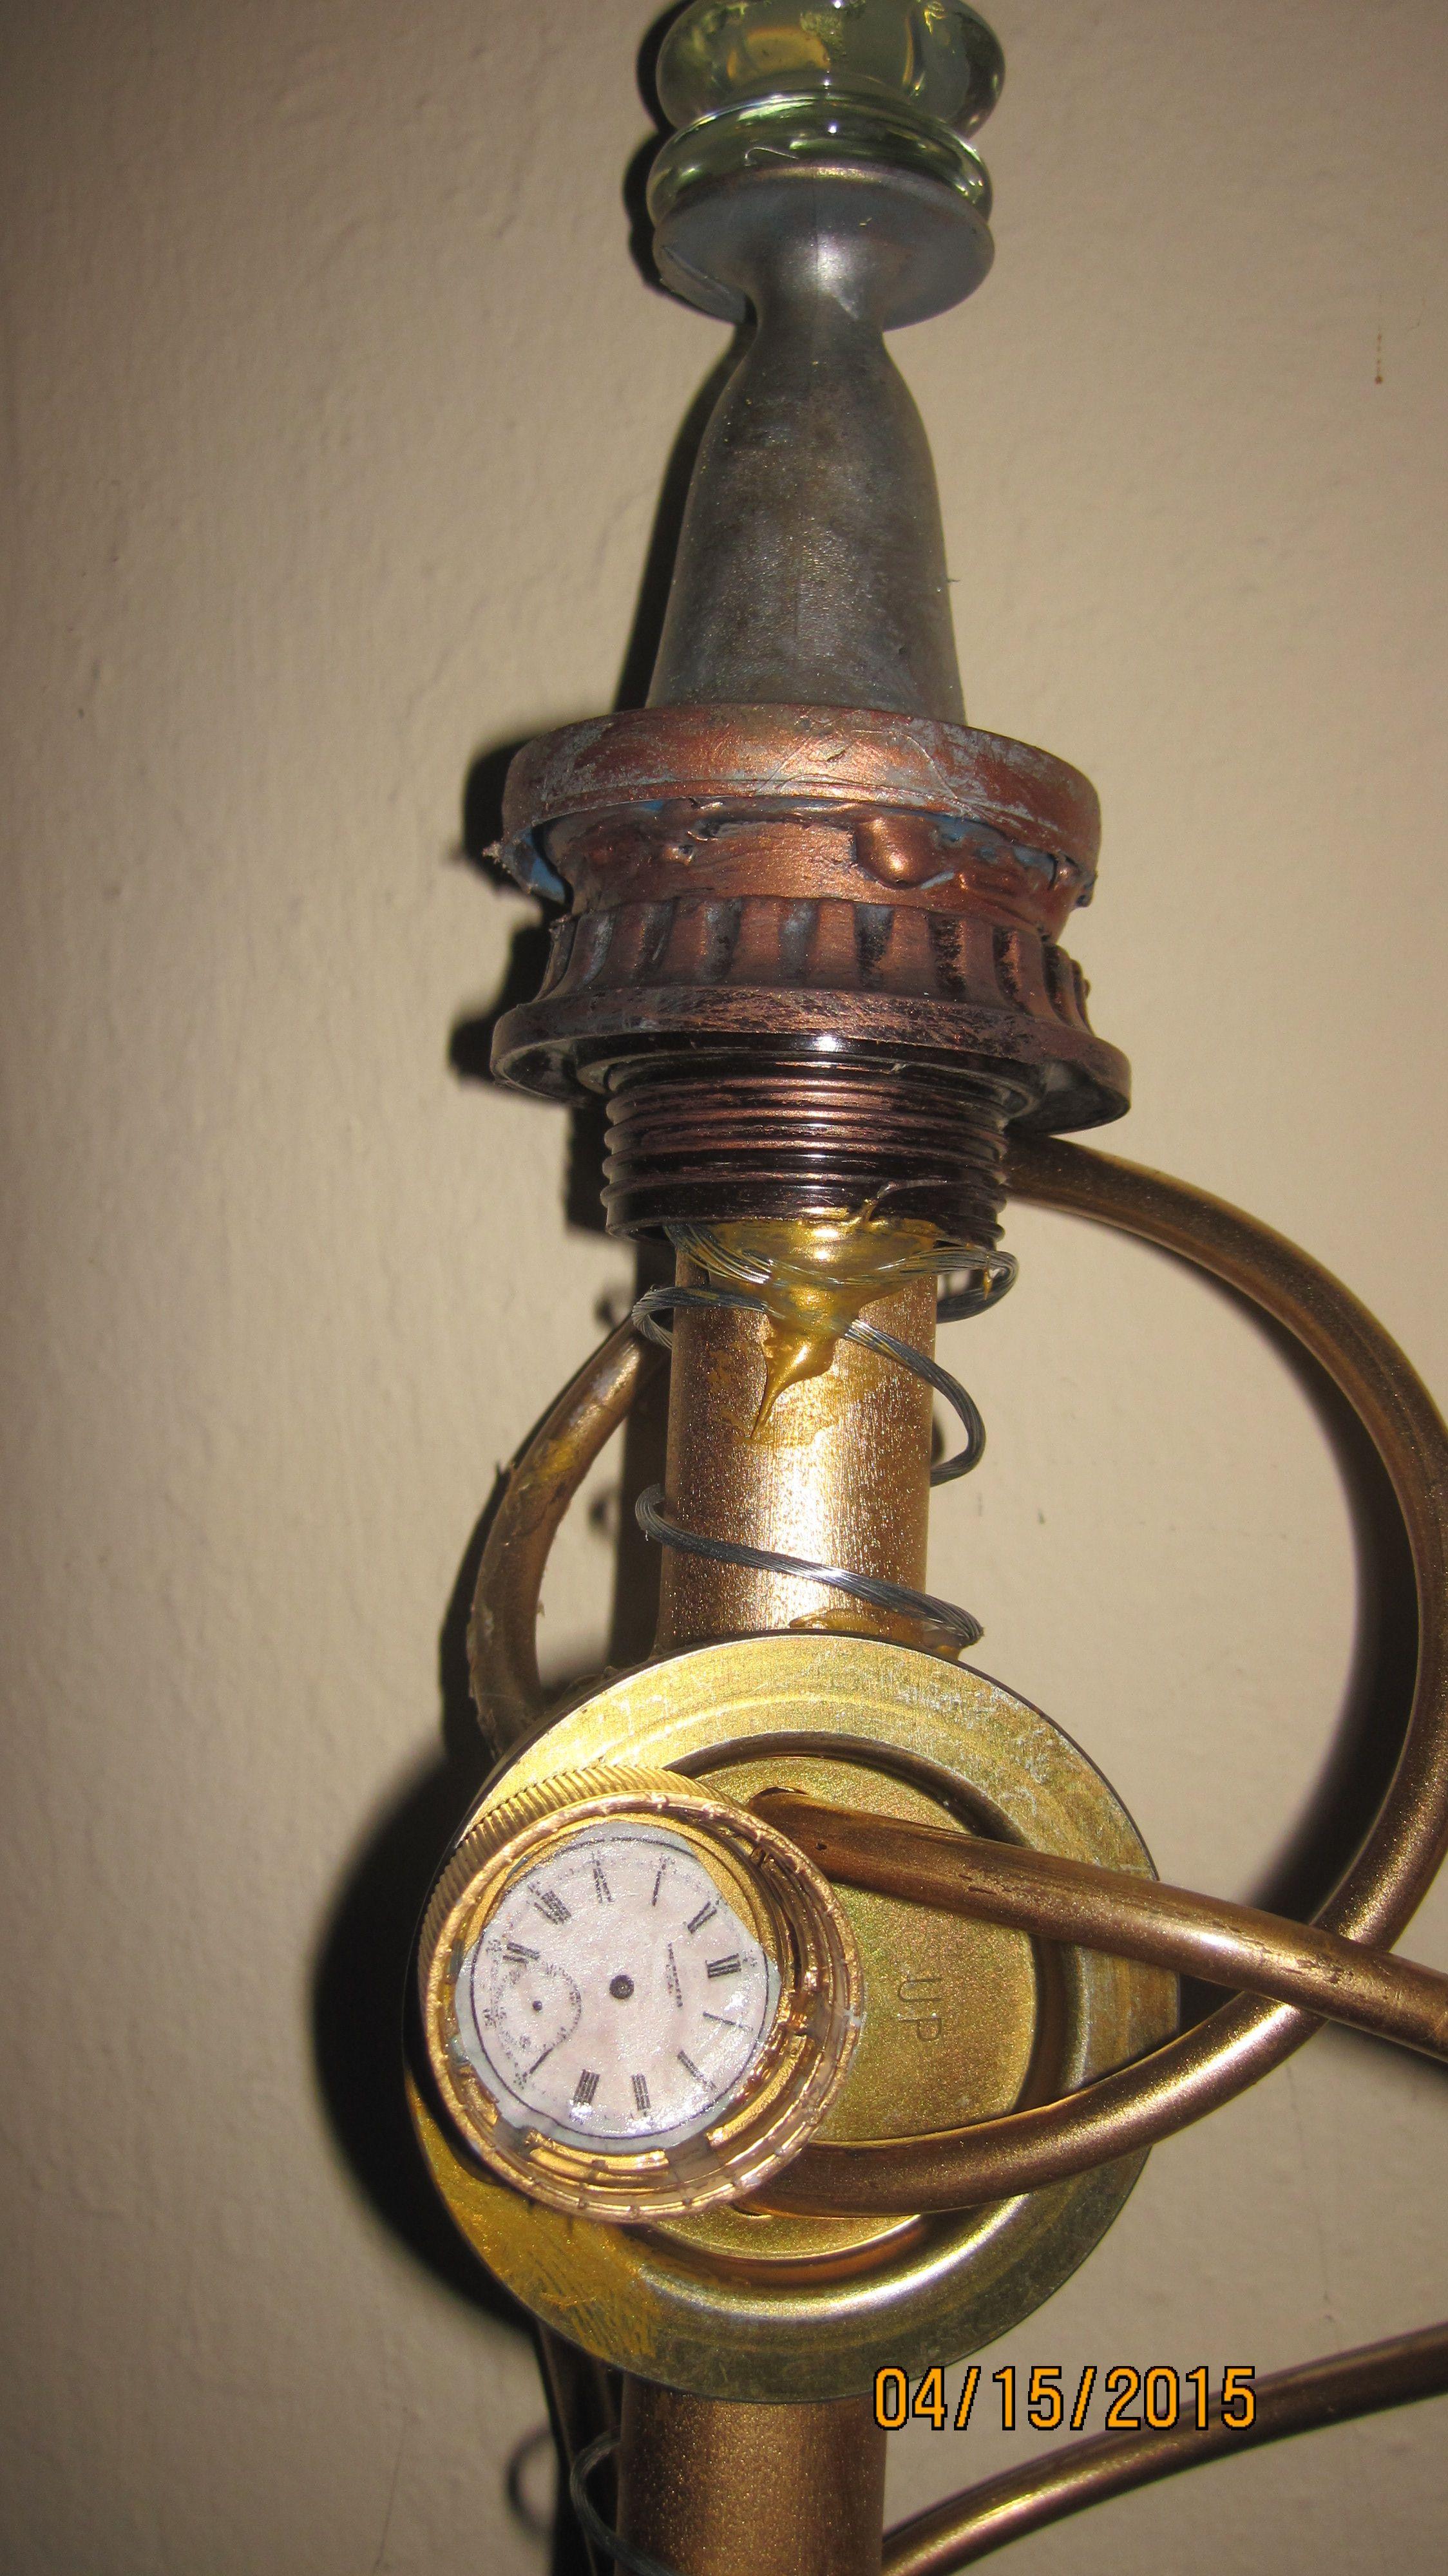 Steampunk Walking Stick Diy From Dowel Door Part Bottle Cap